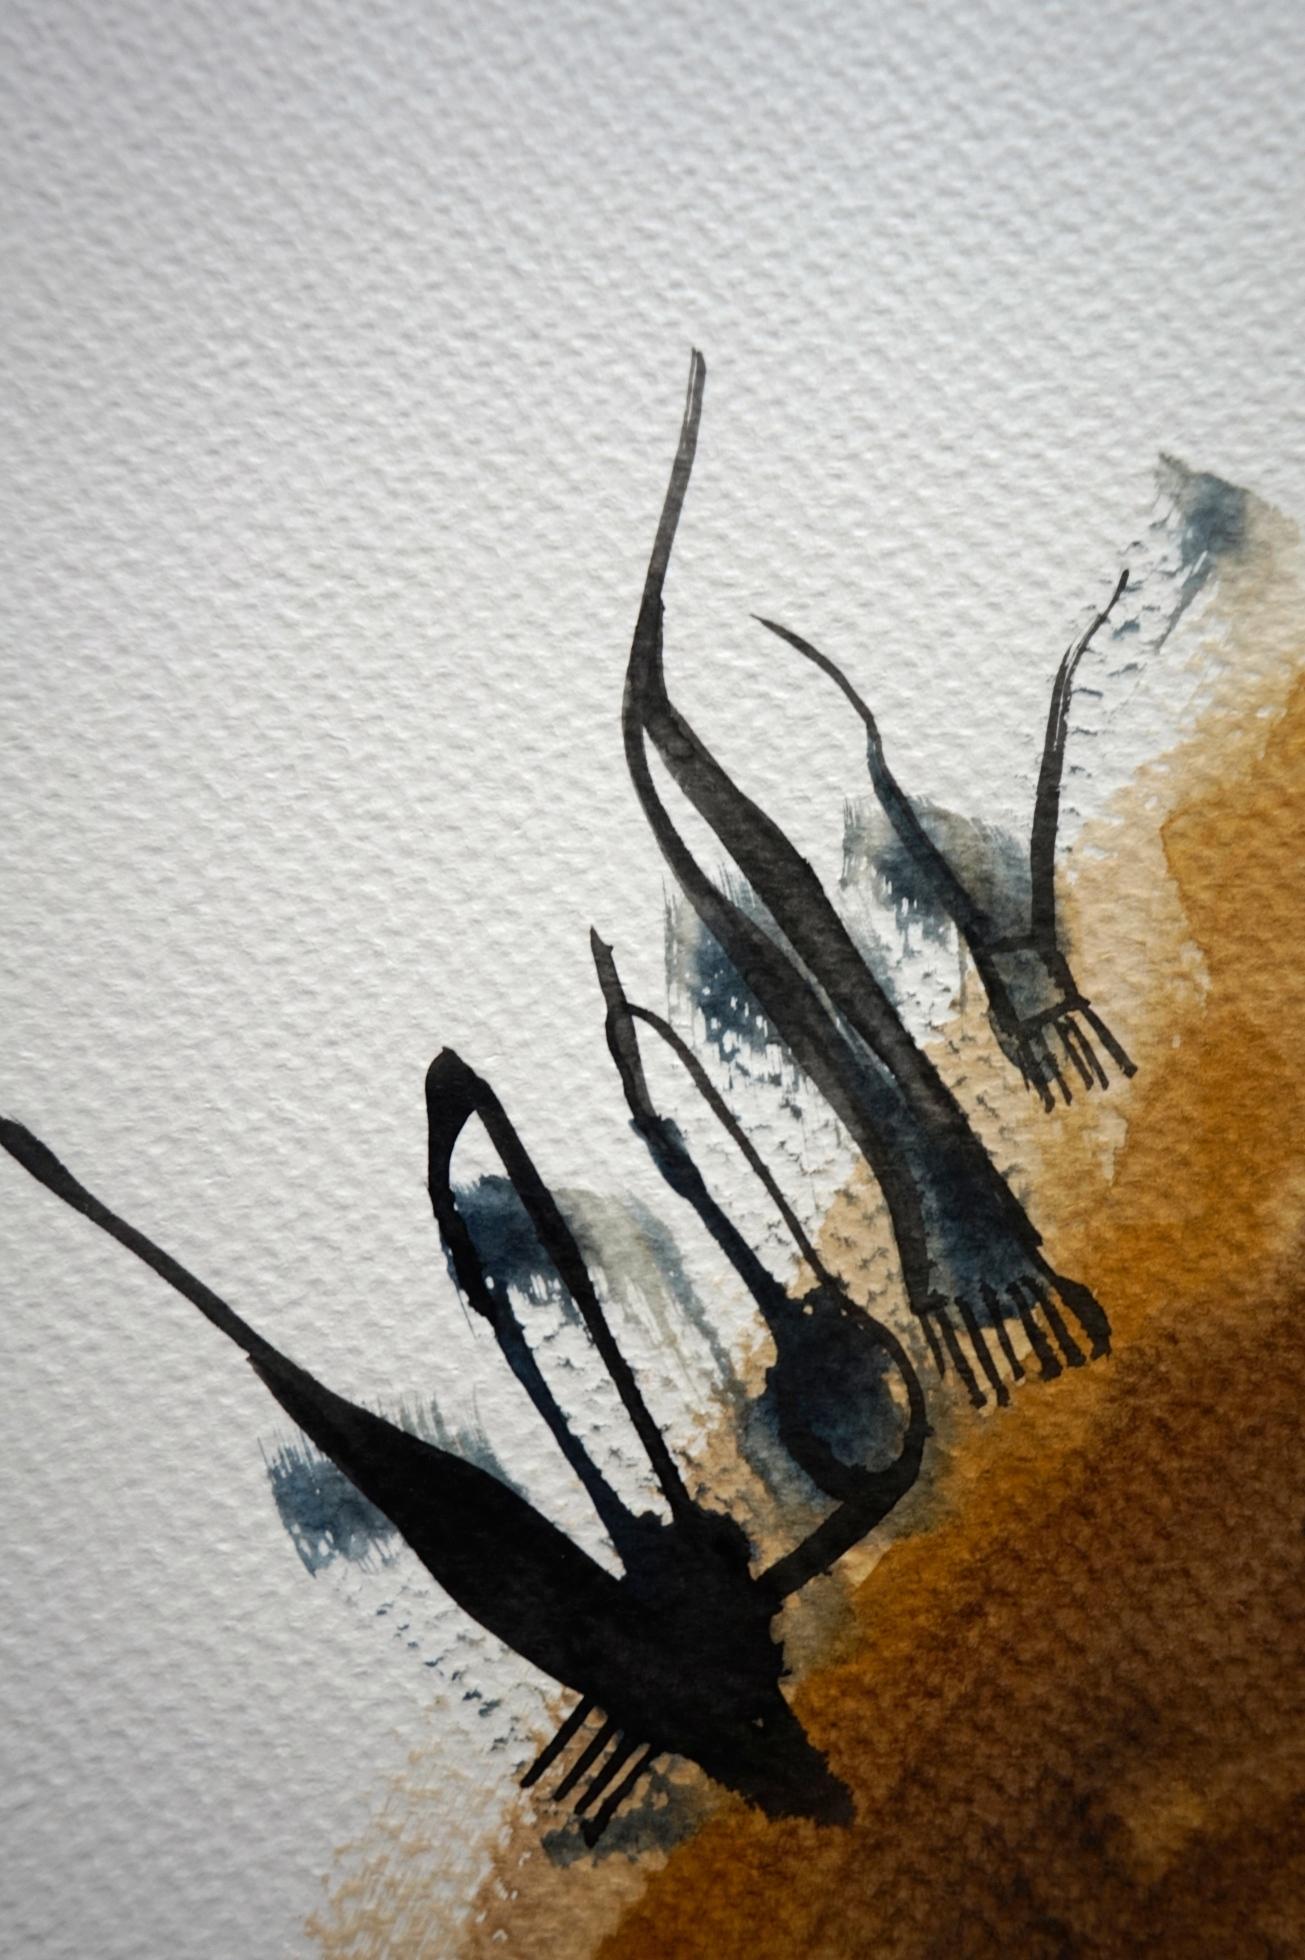 Nasty Little Creatures 5, detail, Laura Barbuto, 2014.